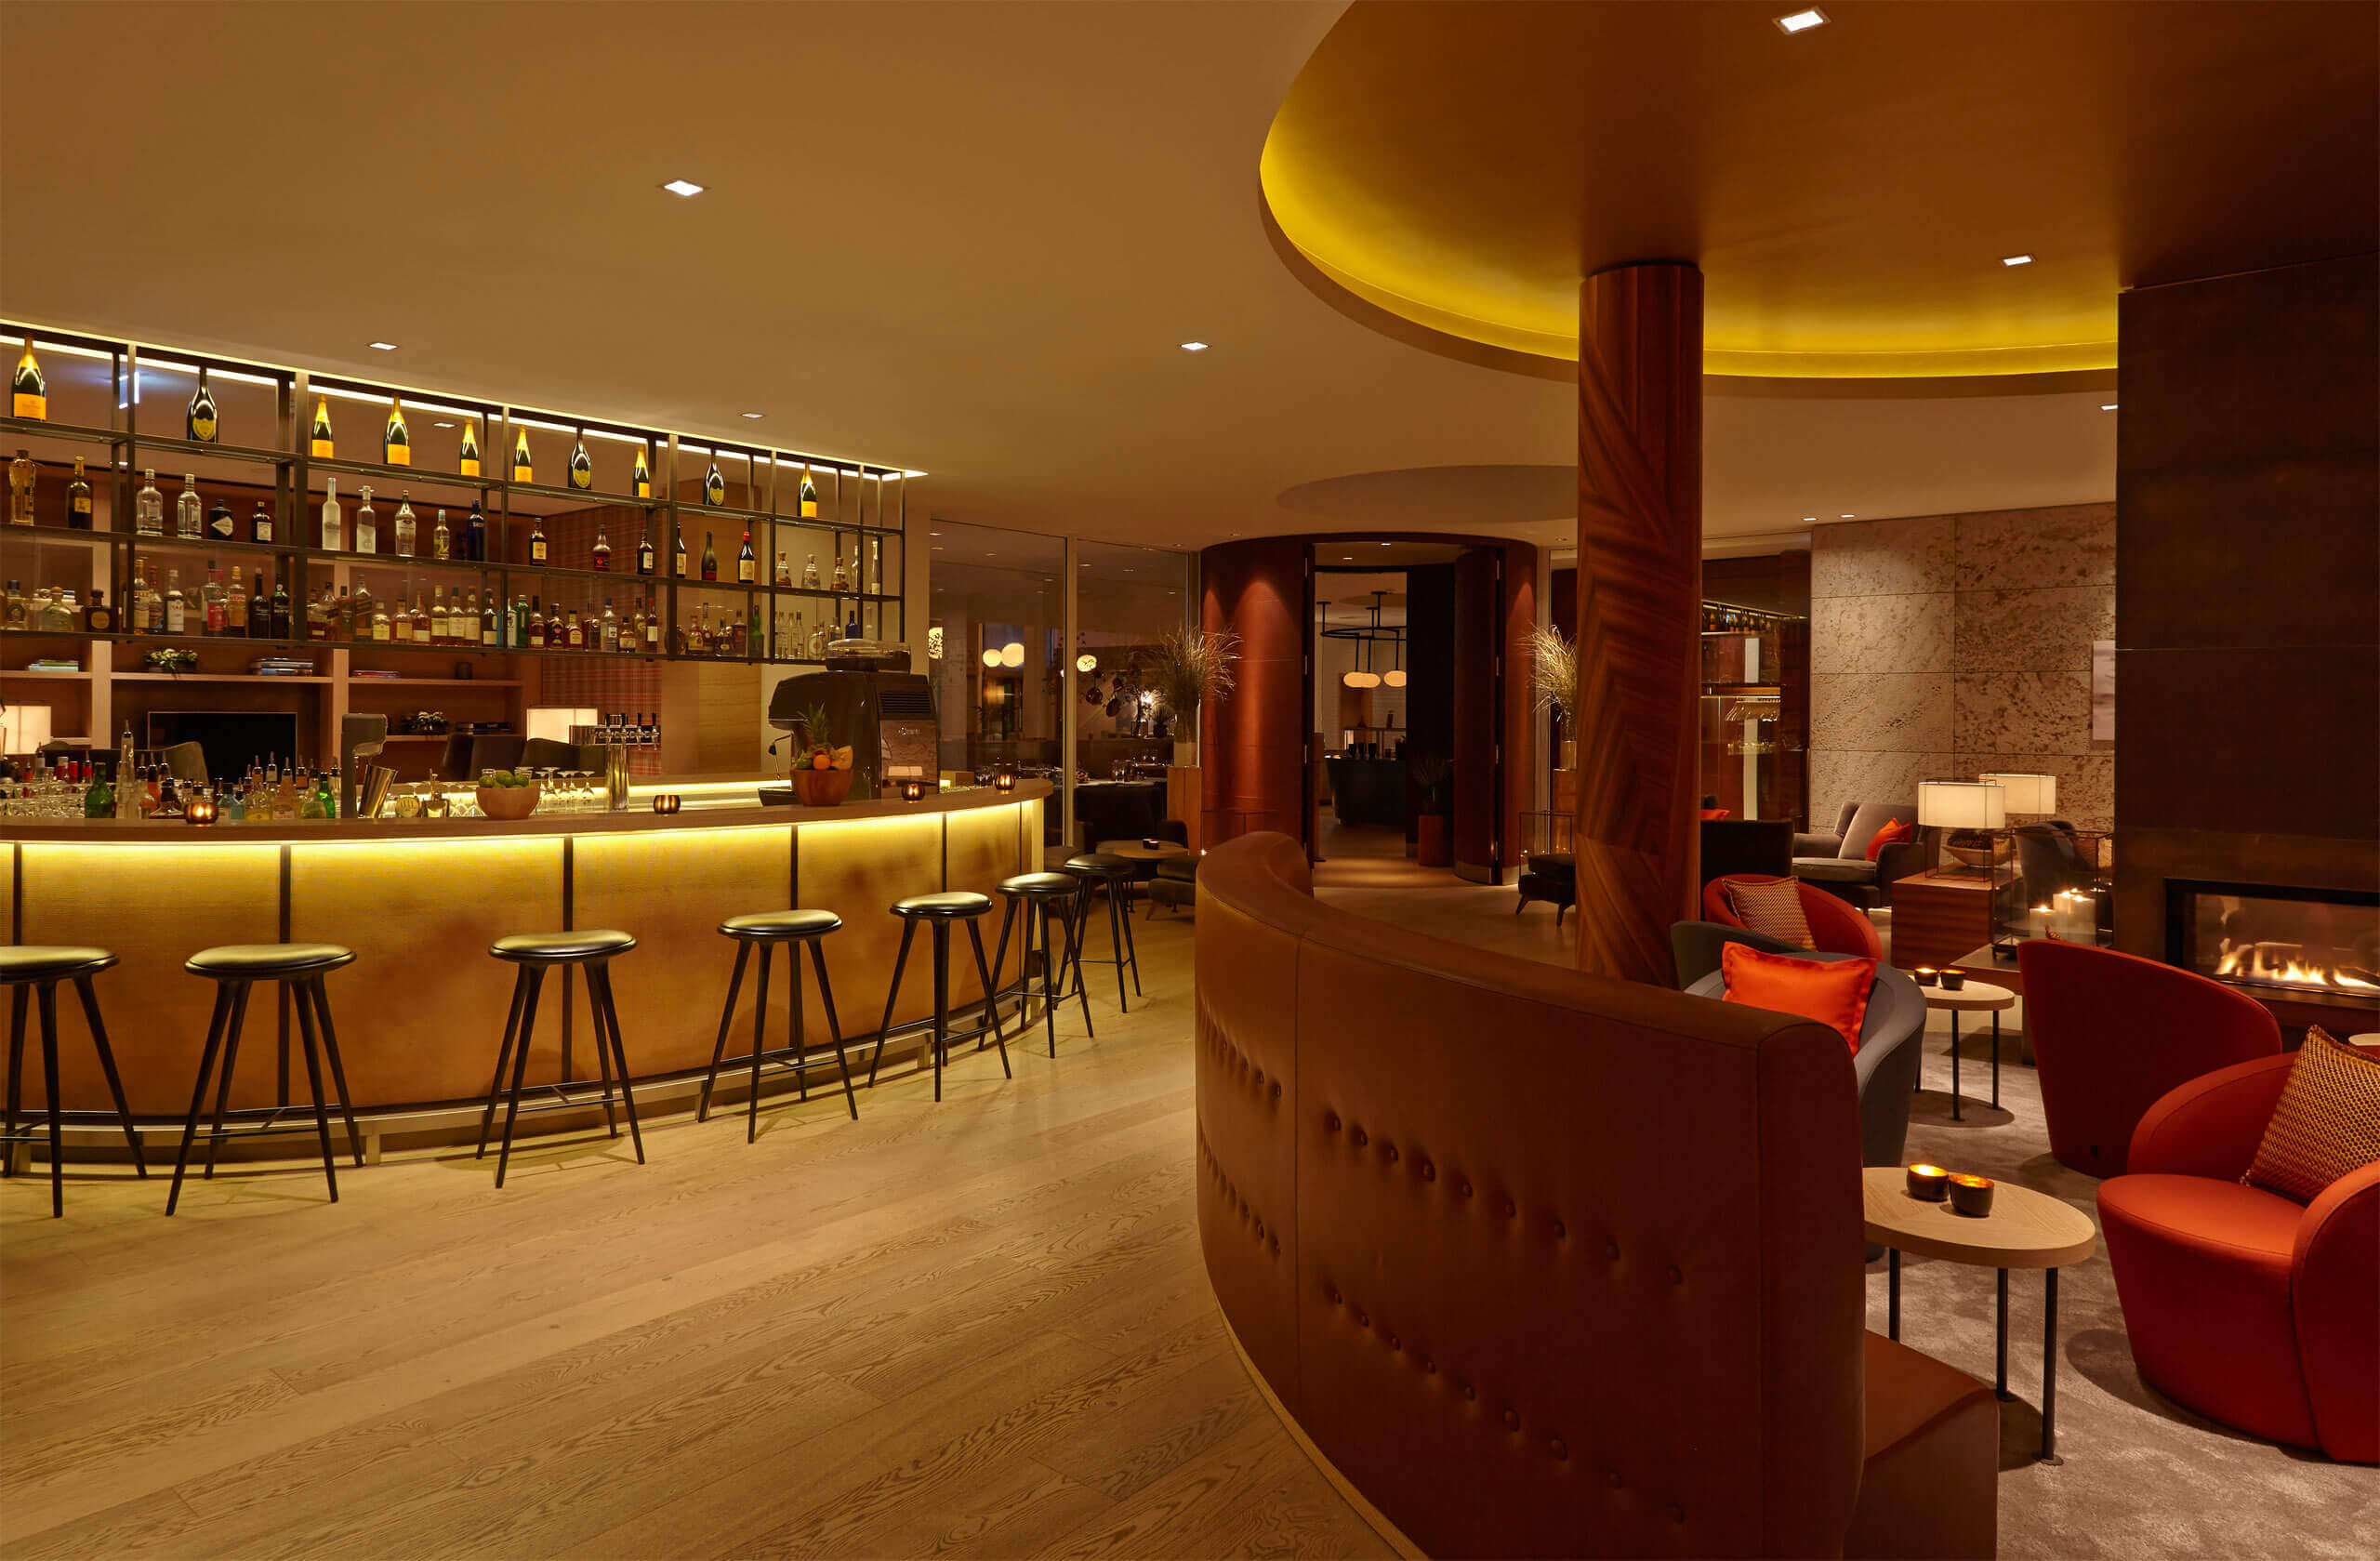 AALERNHÜS hotel & spa | Lobbybar